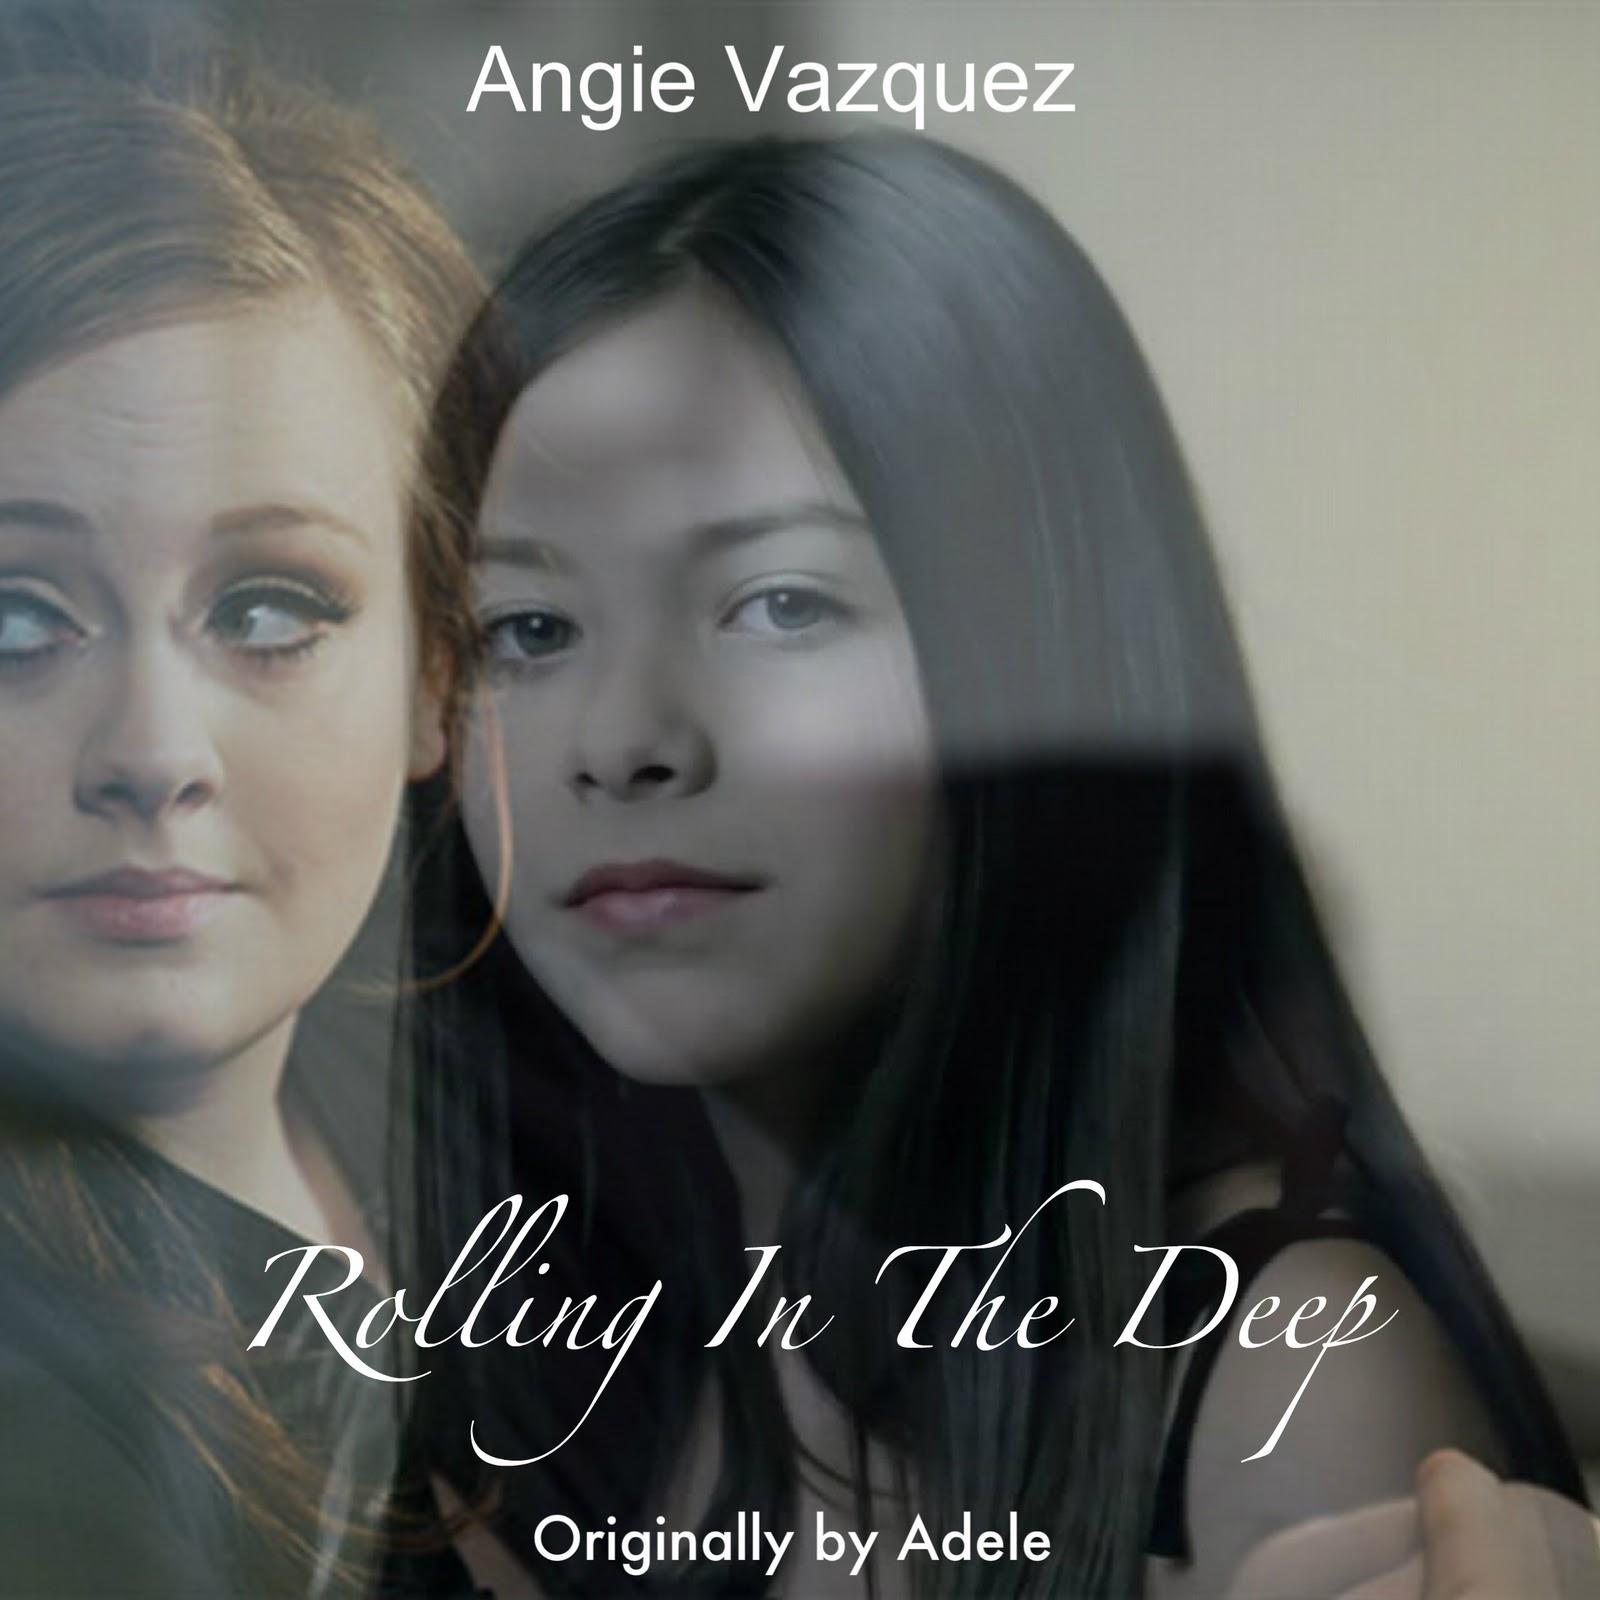 http://2.bp.blogspot.com/-9uuJoouHdMw/TsgMdE1pQyI/AAAAAAAANuY/taqUcYW9b8Q/s1600/Angie+Vazquez+-+Rolling+In+The+Deep+%2528Originally+by+Adele%2529.jpg